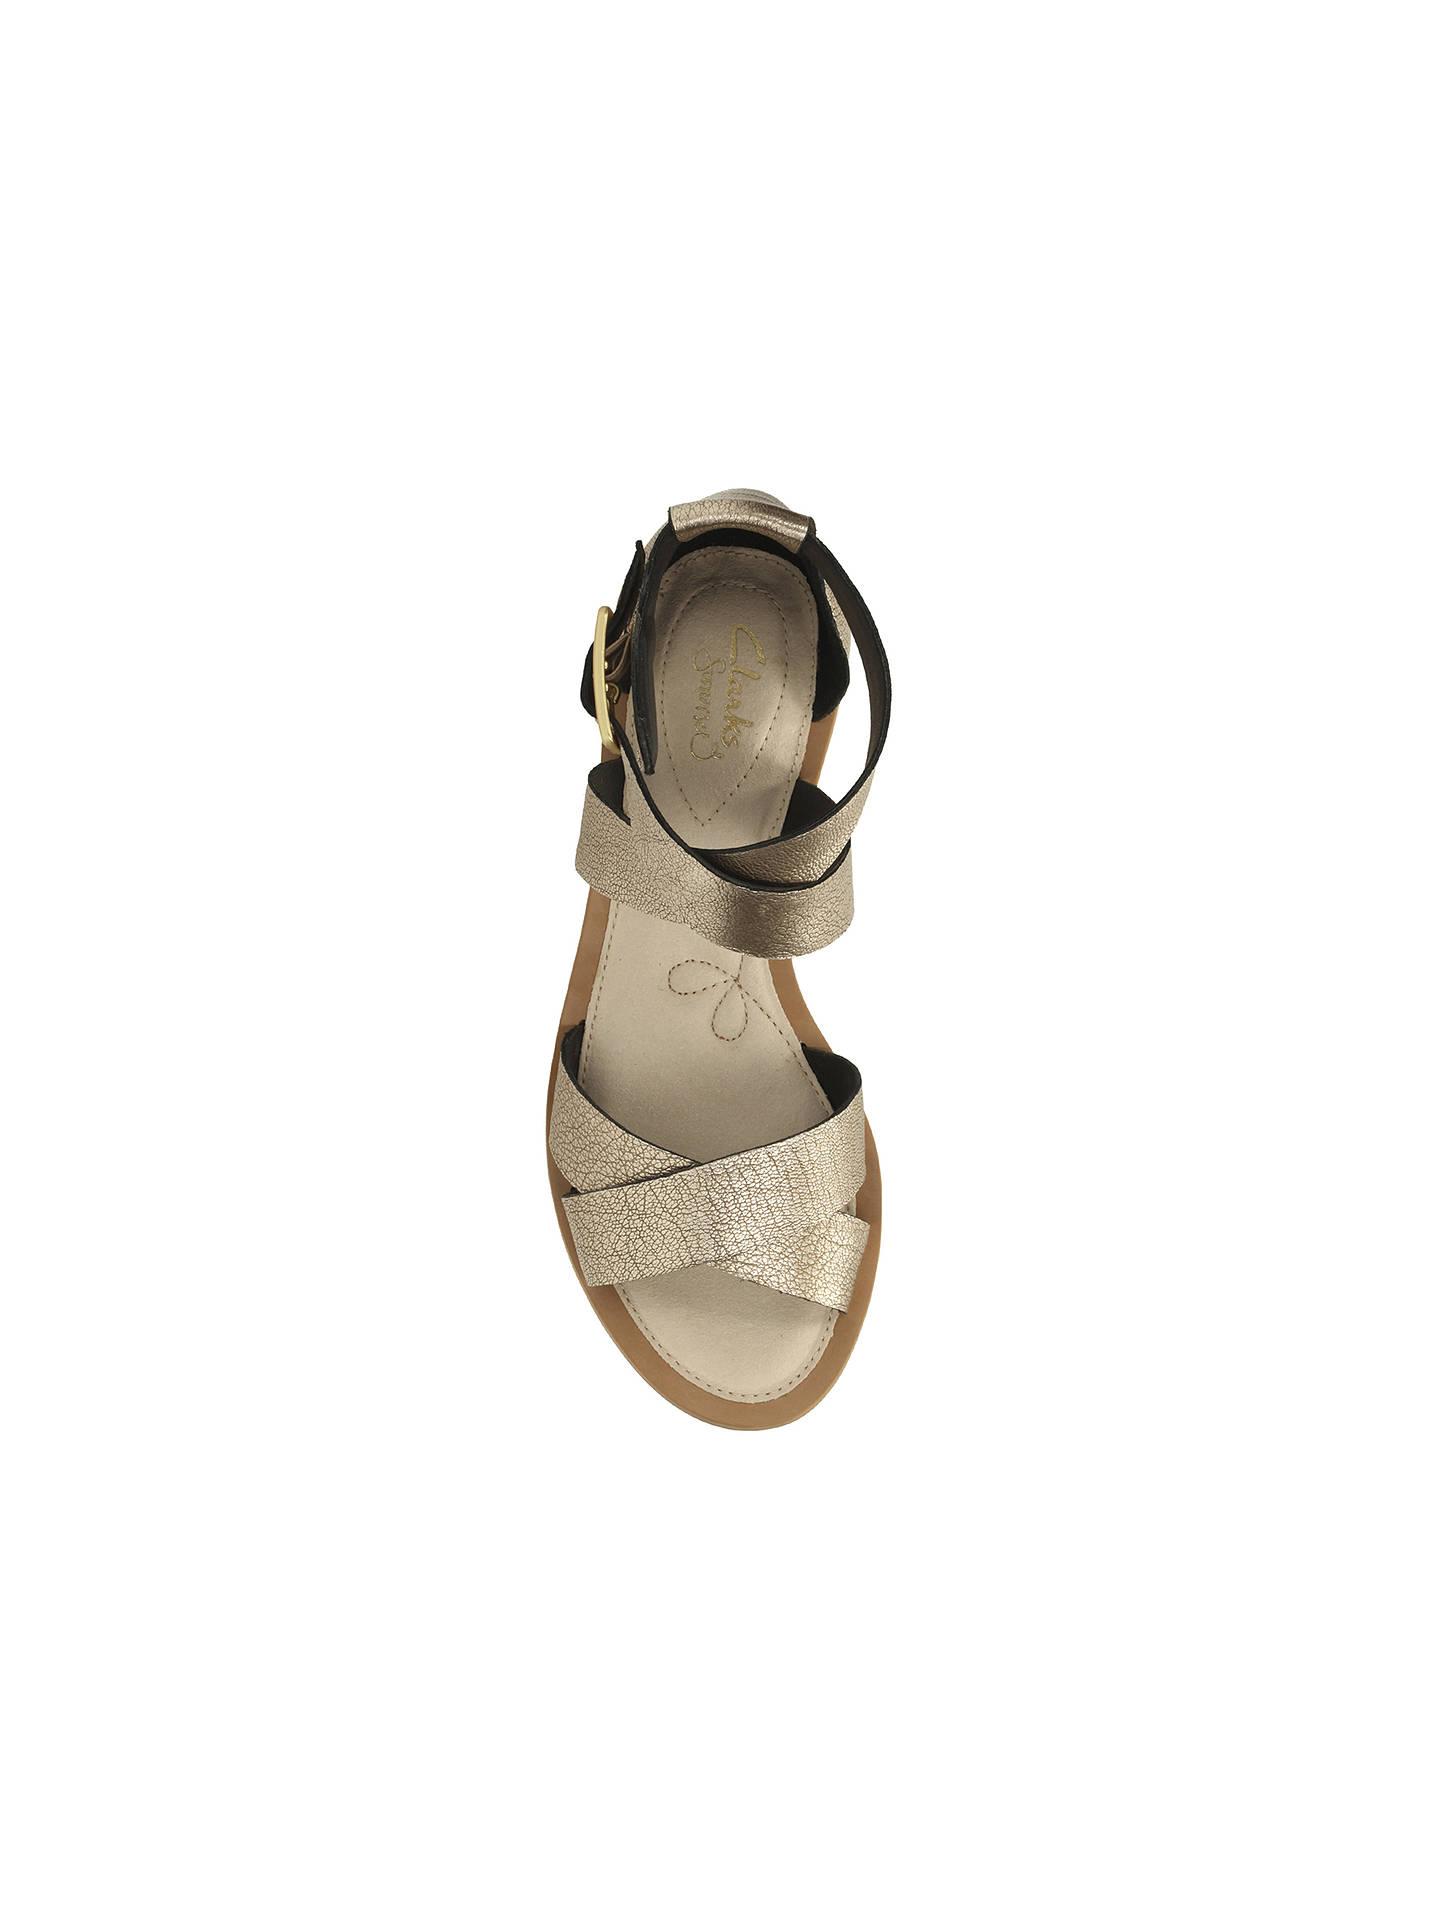 abedc7f431266 ... Buy Clarks Sandcastle Ray Cross Strap Sandals